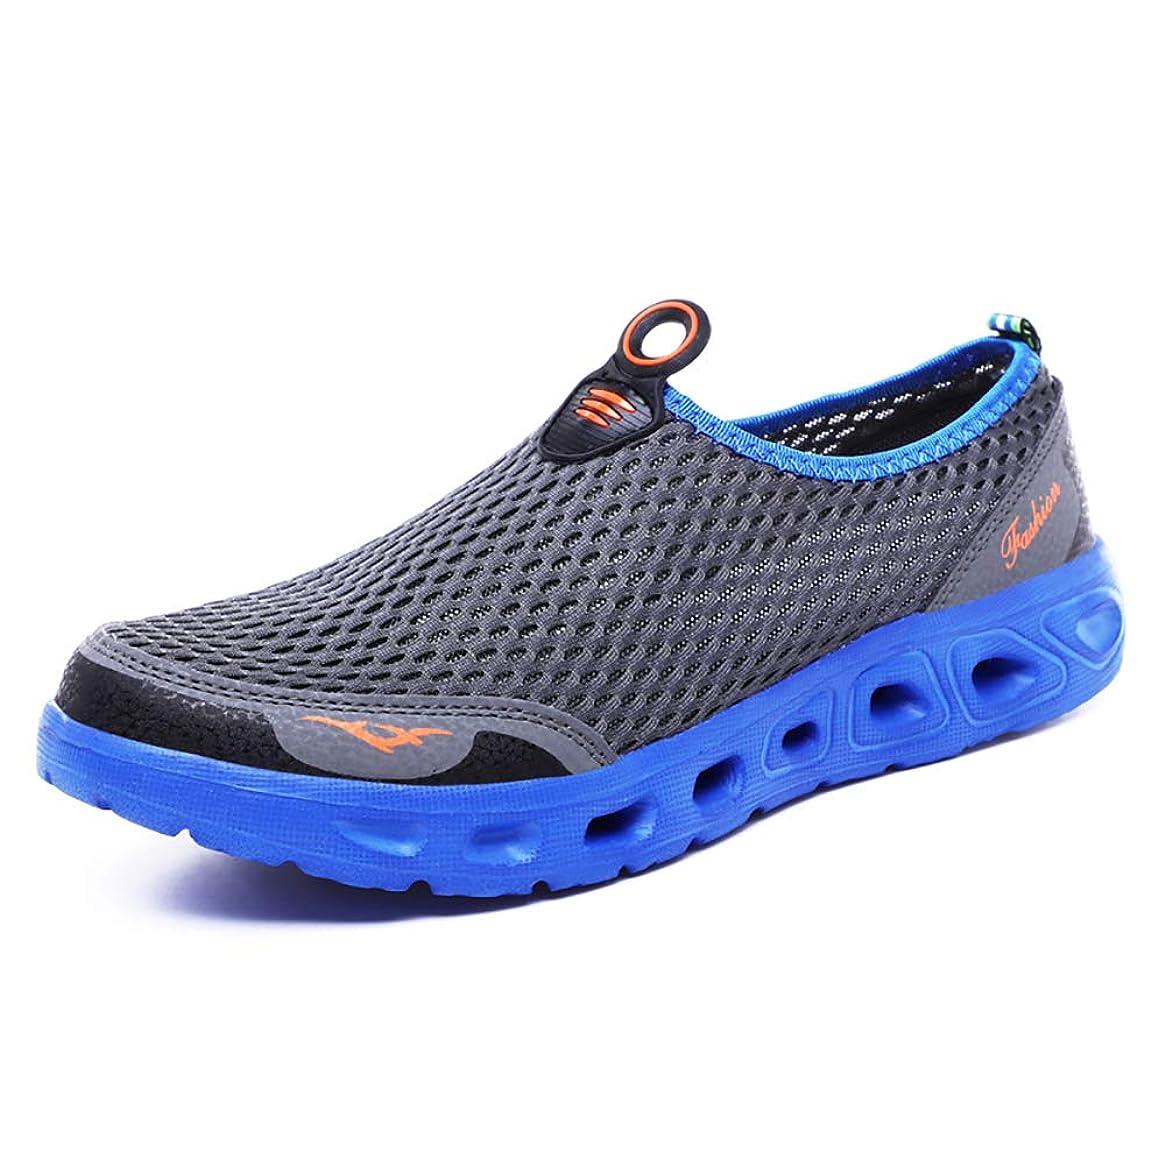 GOOD STUDIOS Men Women Mesh Water Shoes Quick Dry Slip-on Aqua Shoes for Swimming Pool Beach Walking Running Exercise